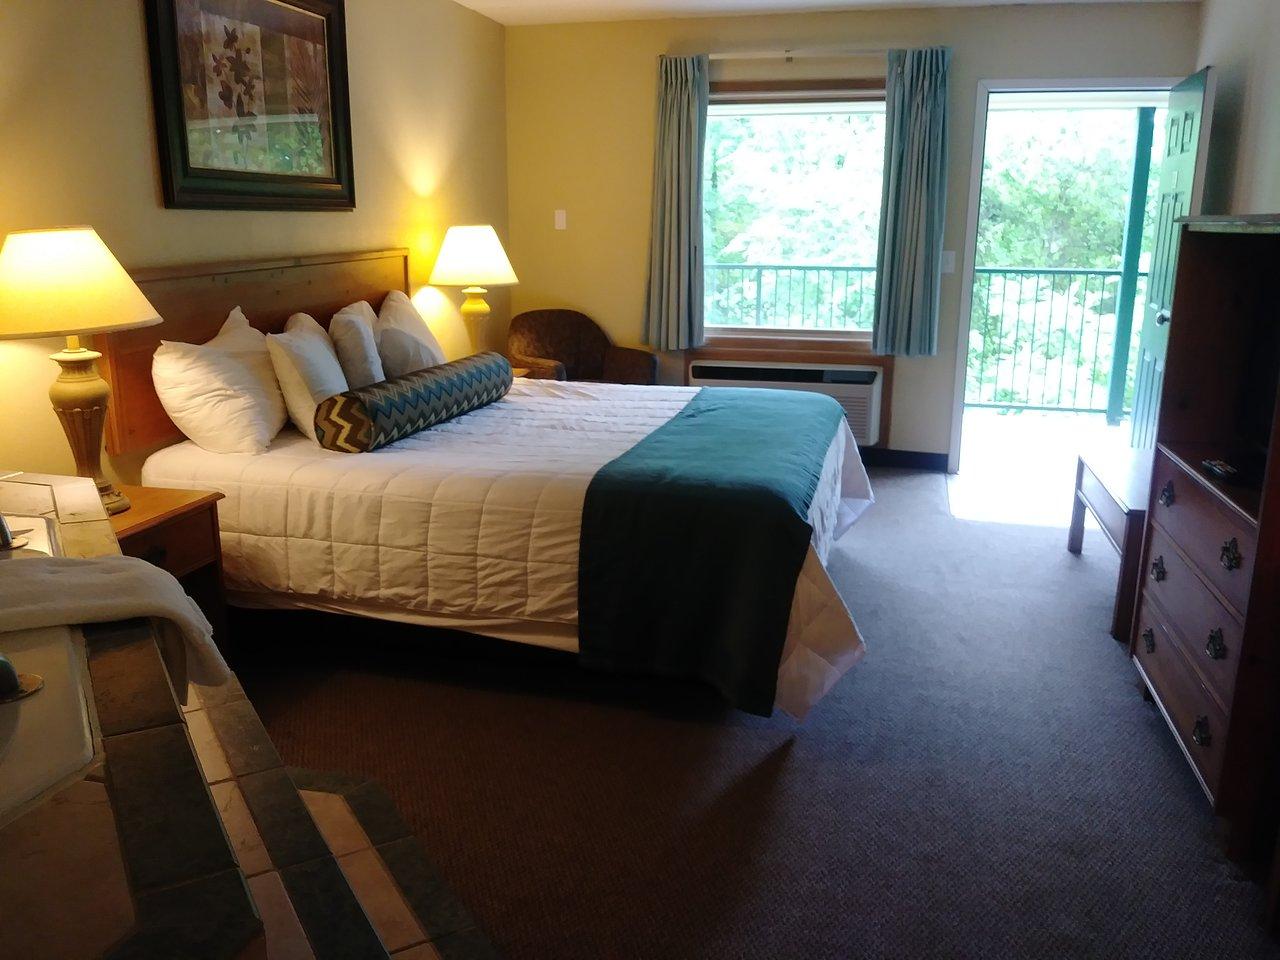 Four Seasons Inn Prices Hotel Reviews Branson Mo Tripadvisor